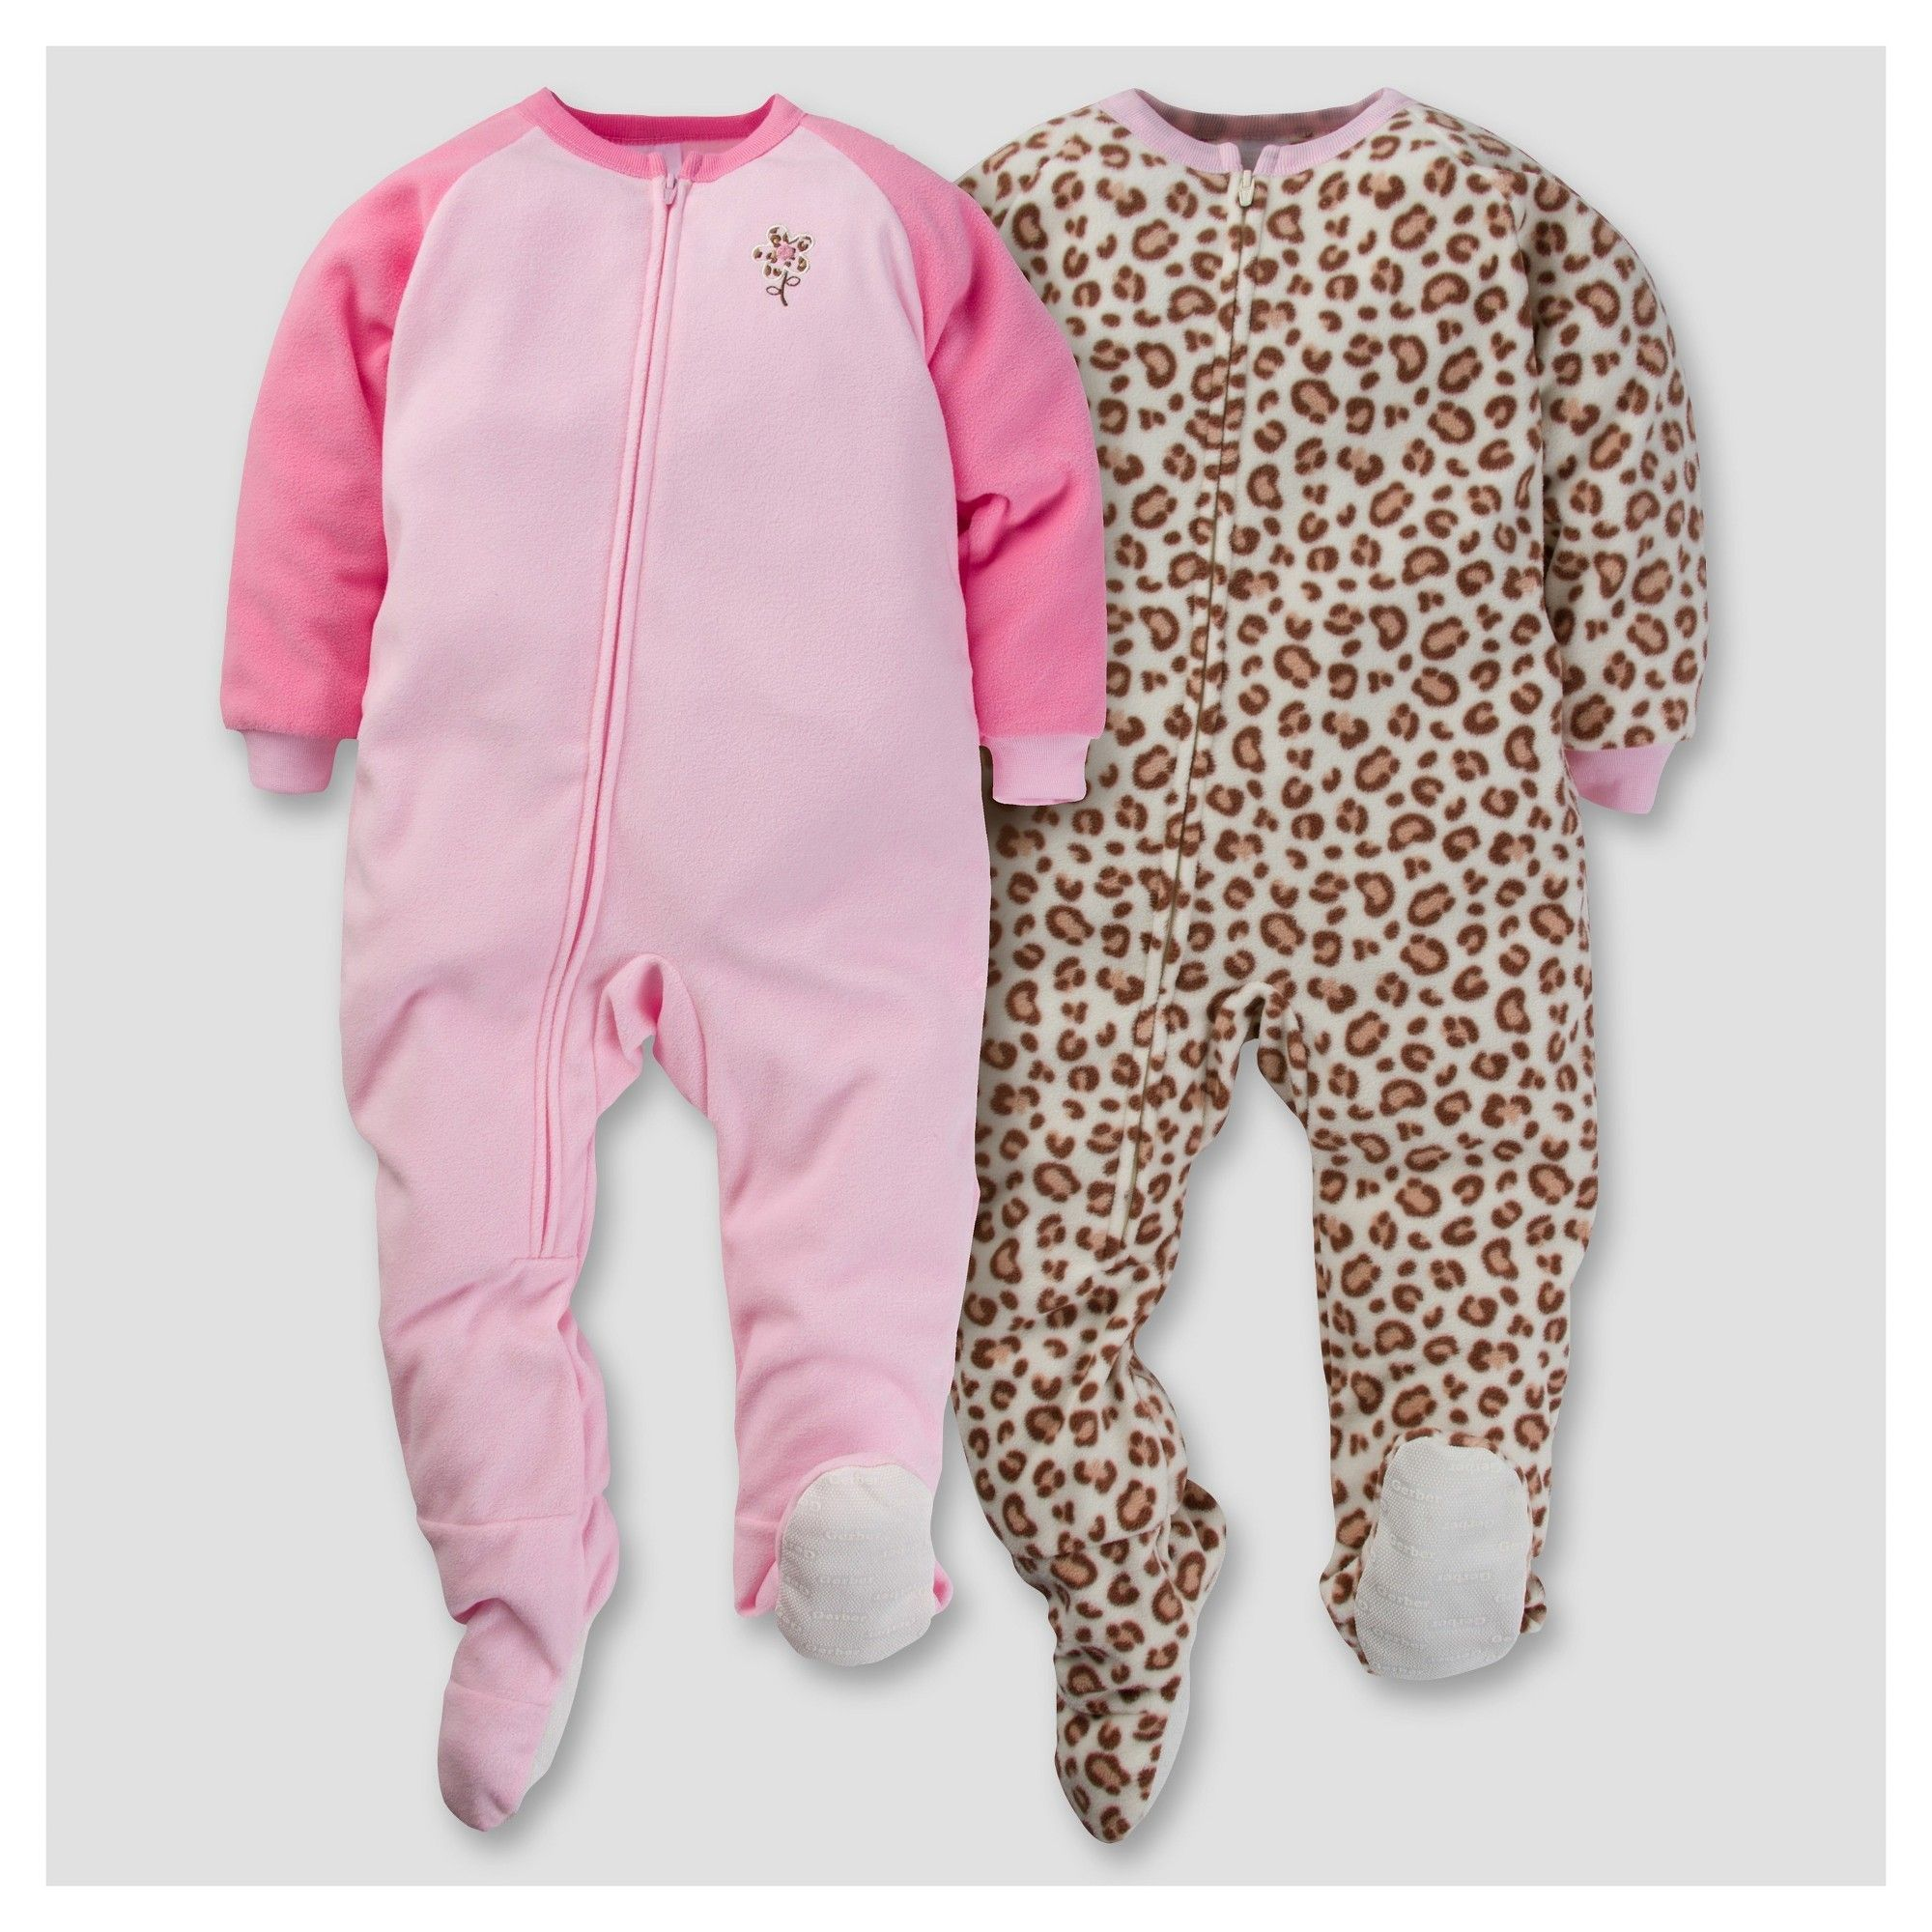 Gerber Toddler Girl 2pk Leopard Print Flower Microfleece Zip-Front Footed  Blanket Sleepers - Pink 5T 1c310ee6f